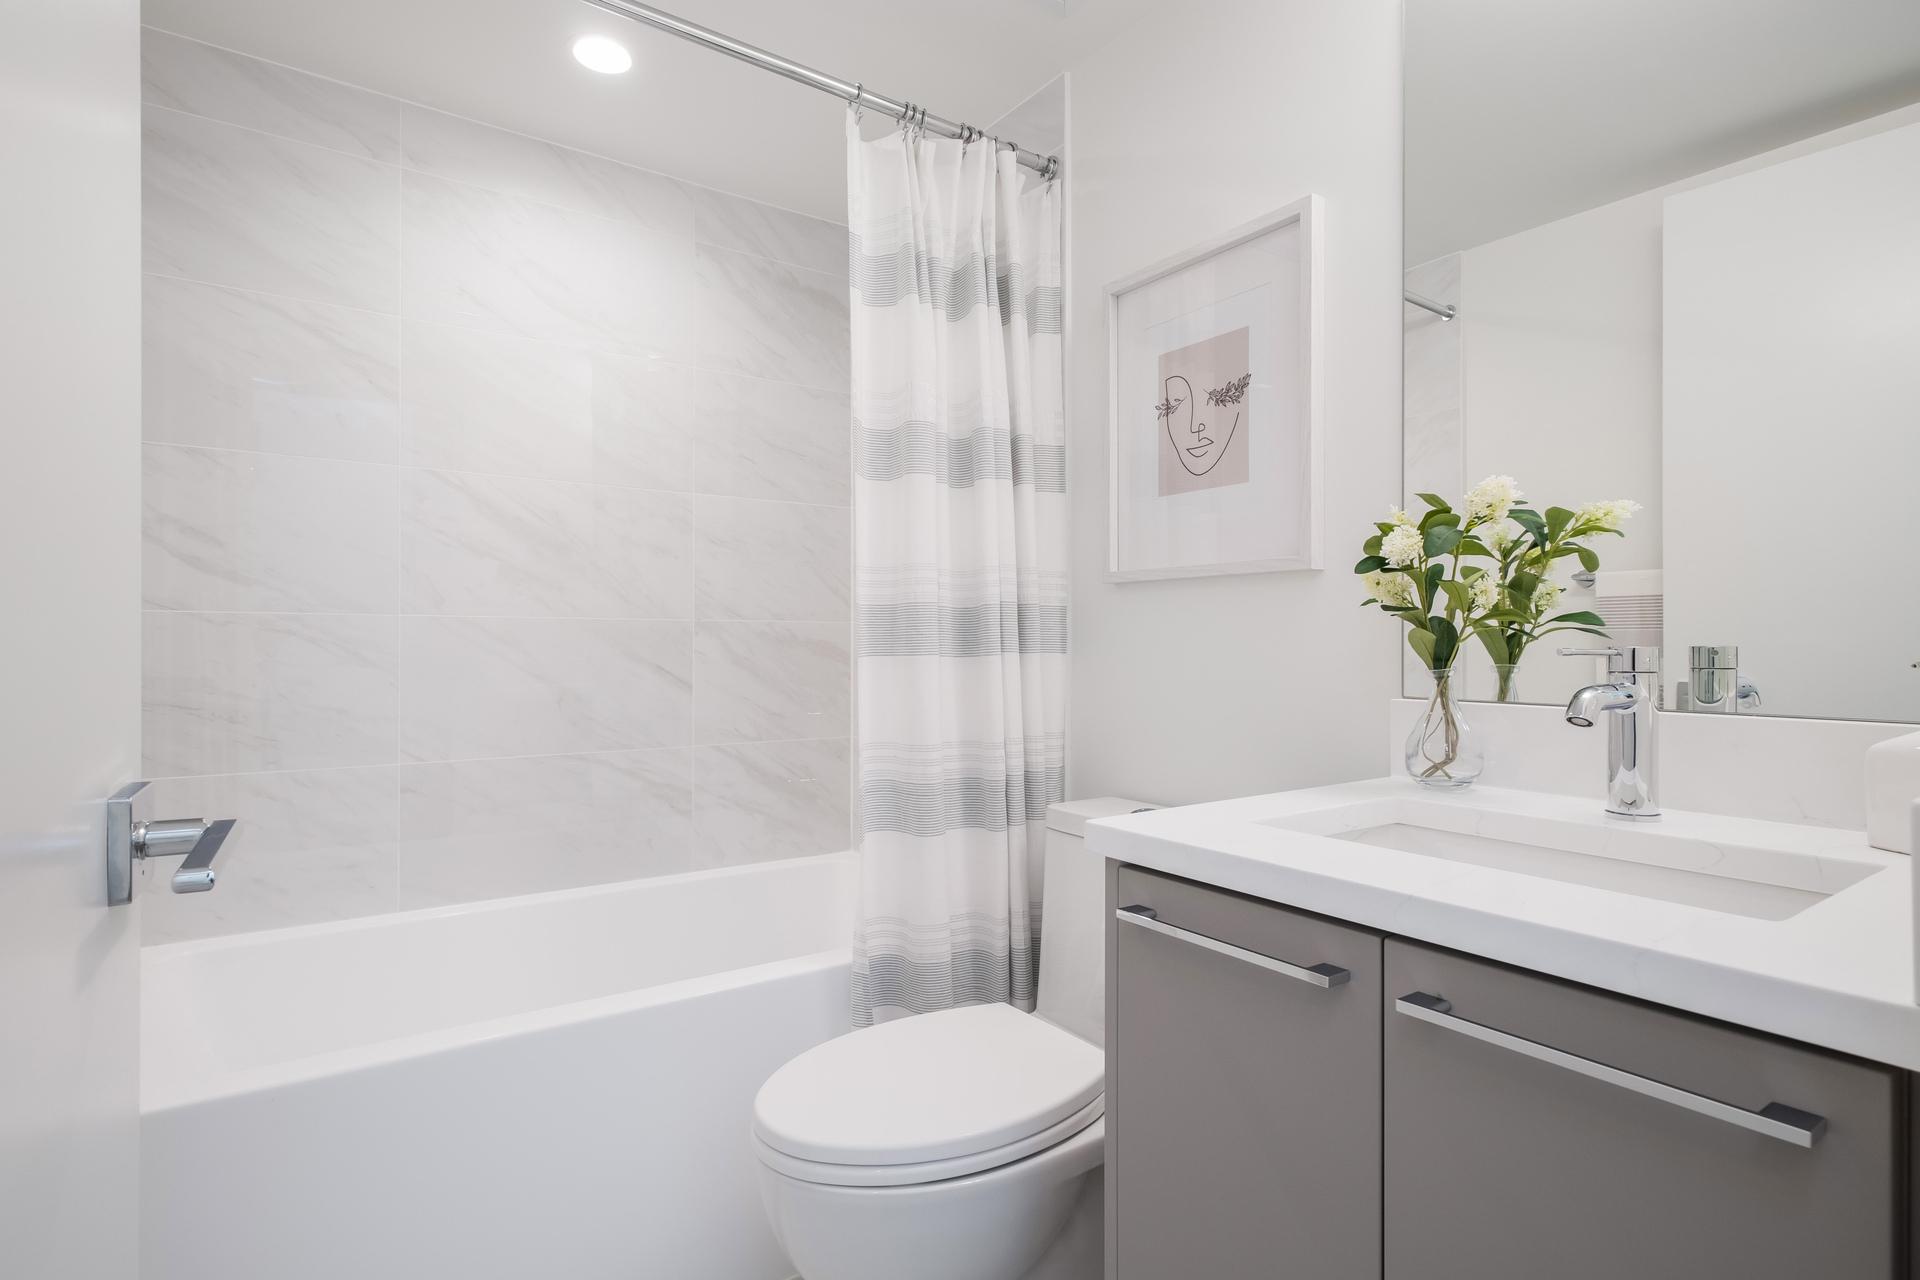 Bathroom at 2317 St. Andrews Street, Port Moody Centre, Port Moody